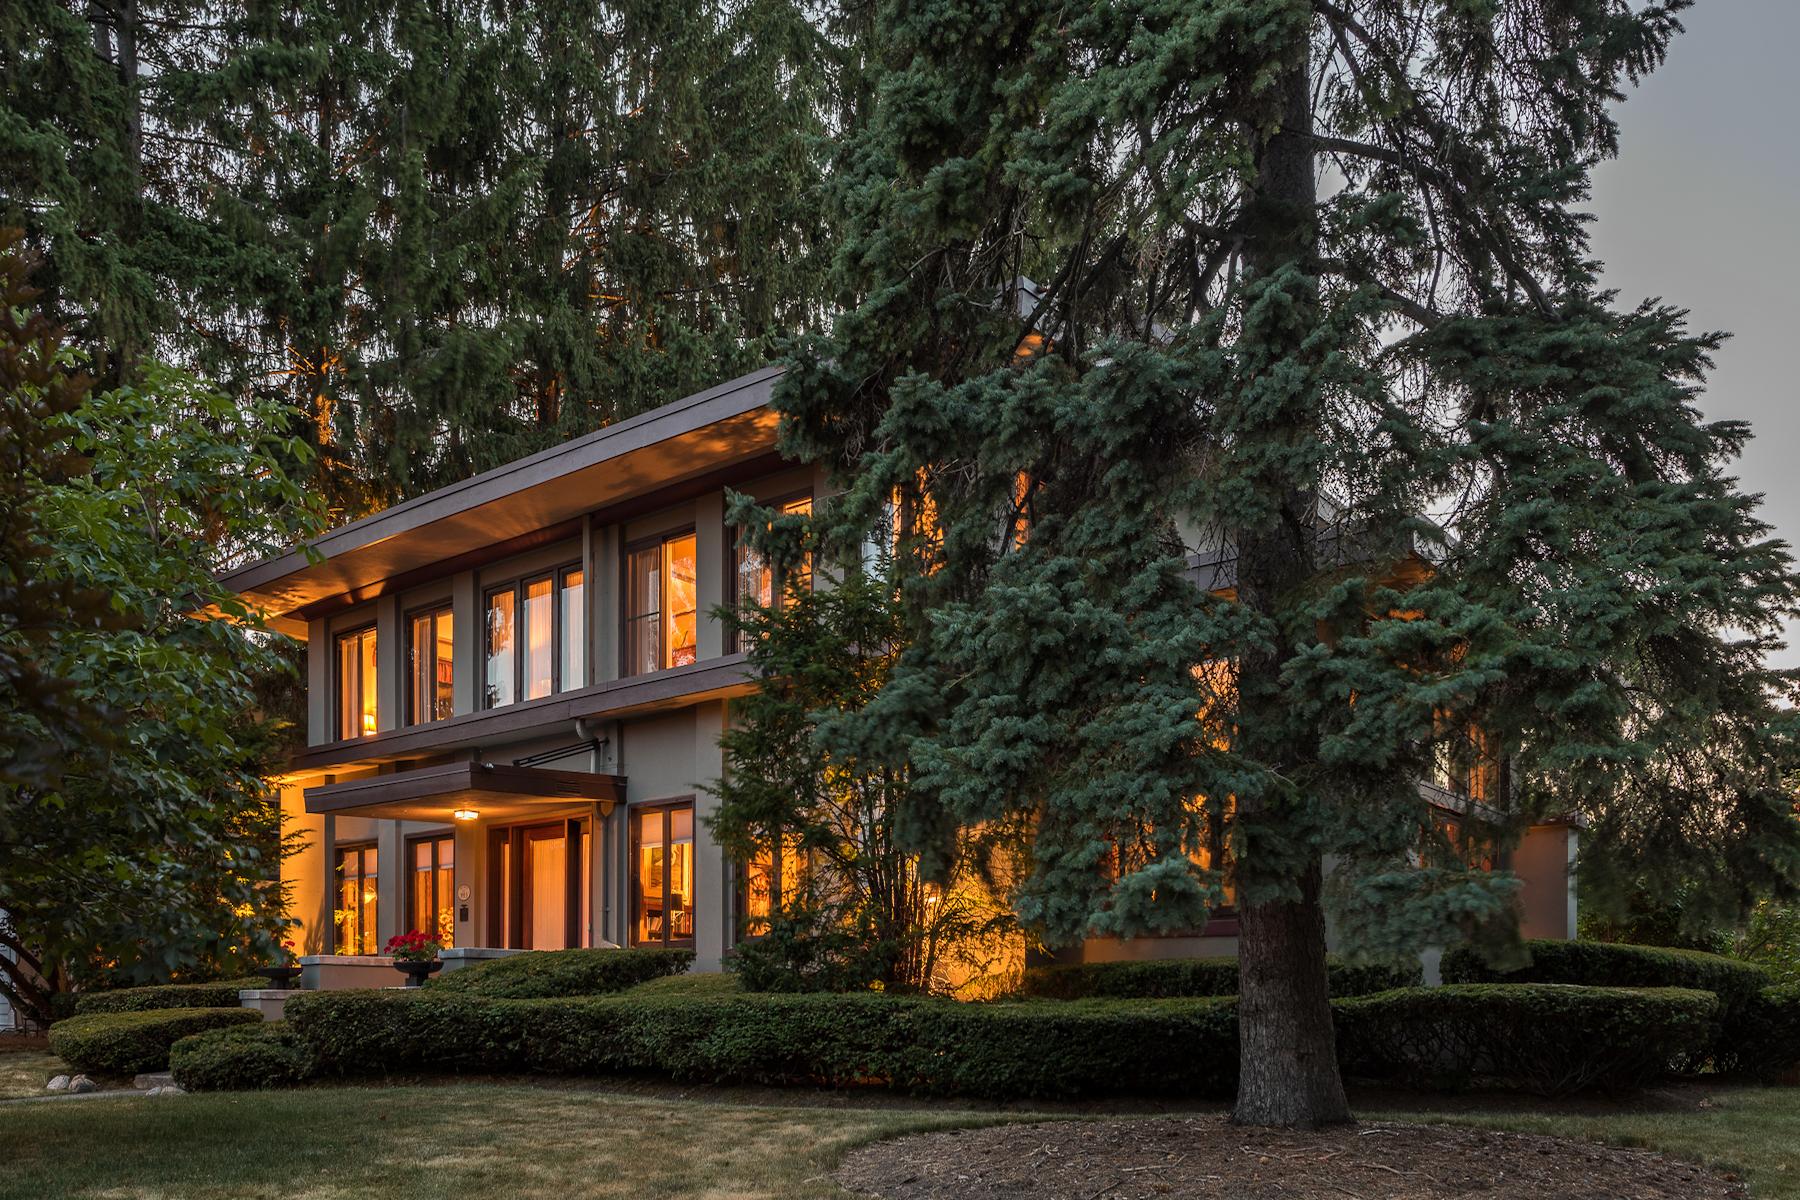 Single Family Home for Sale at Frank Lloyd Wright Inspired 380 Washington St Geneva, New York 14456 United States